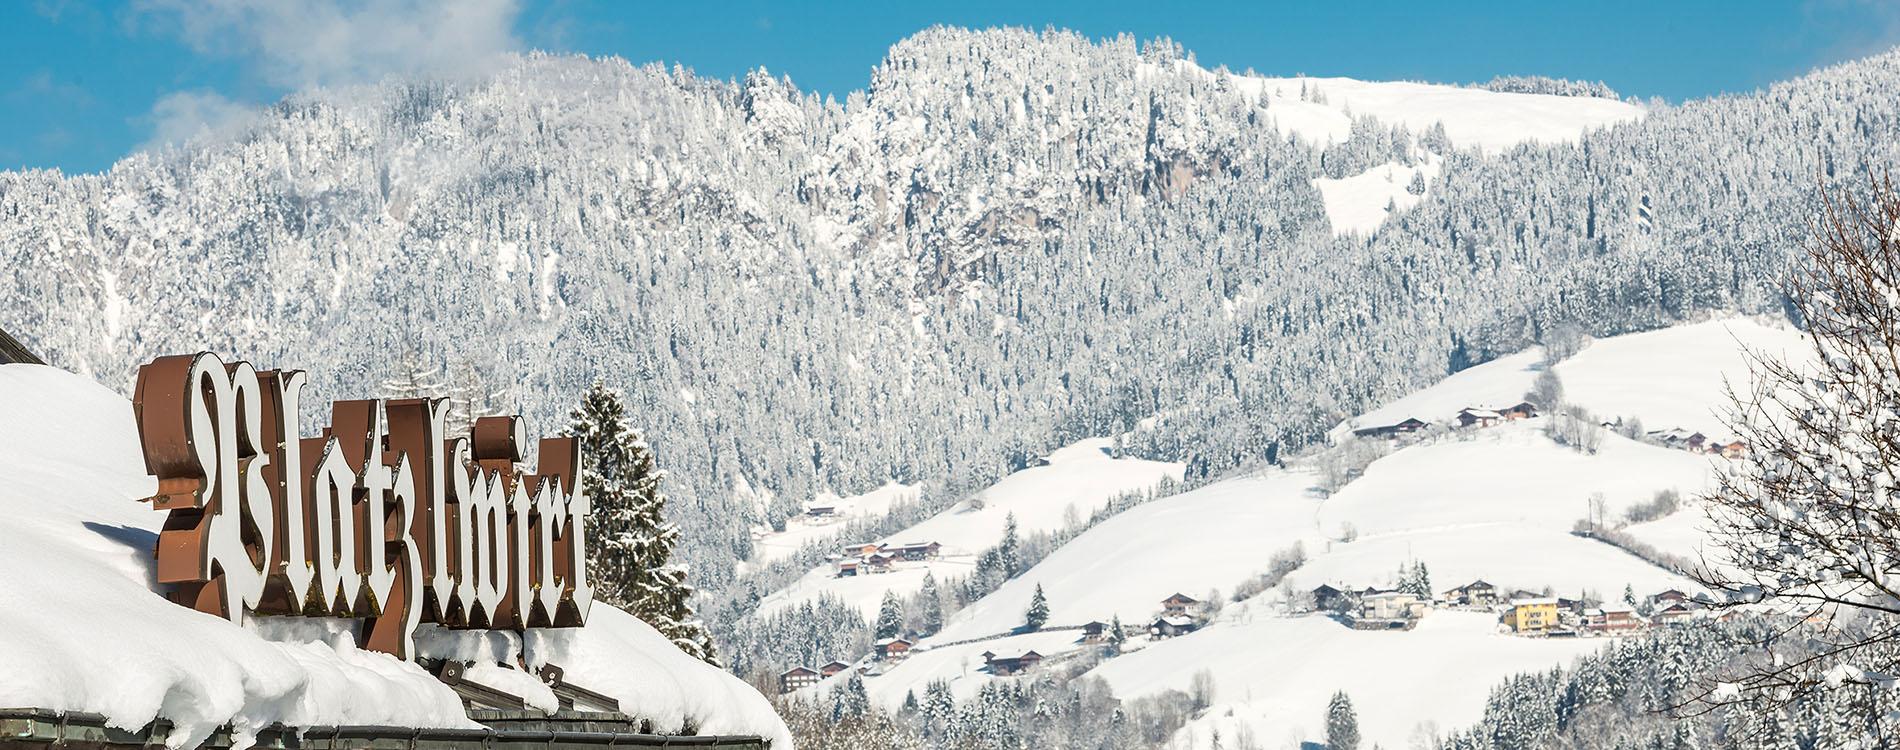 slider_winter2